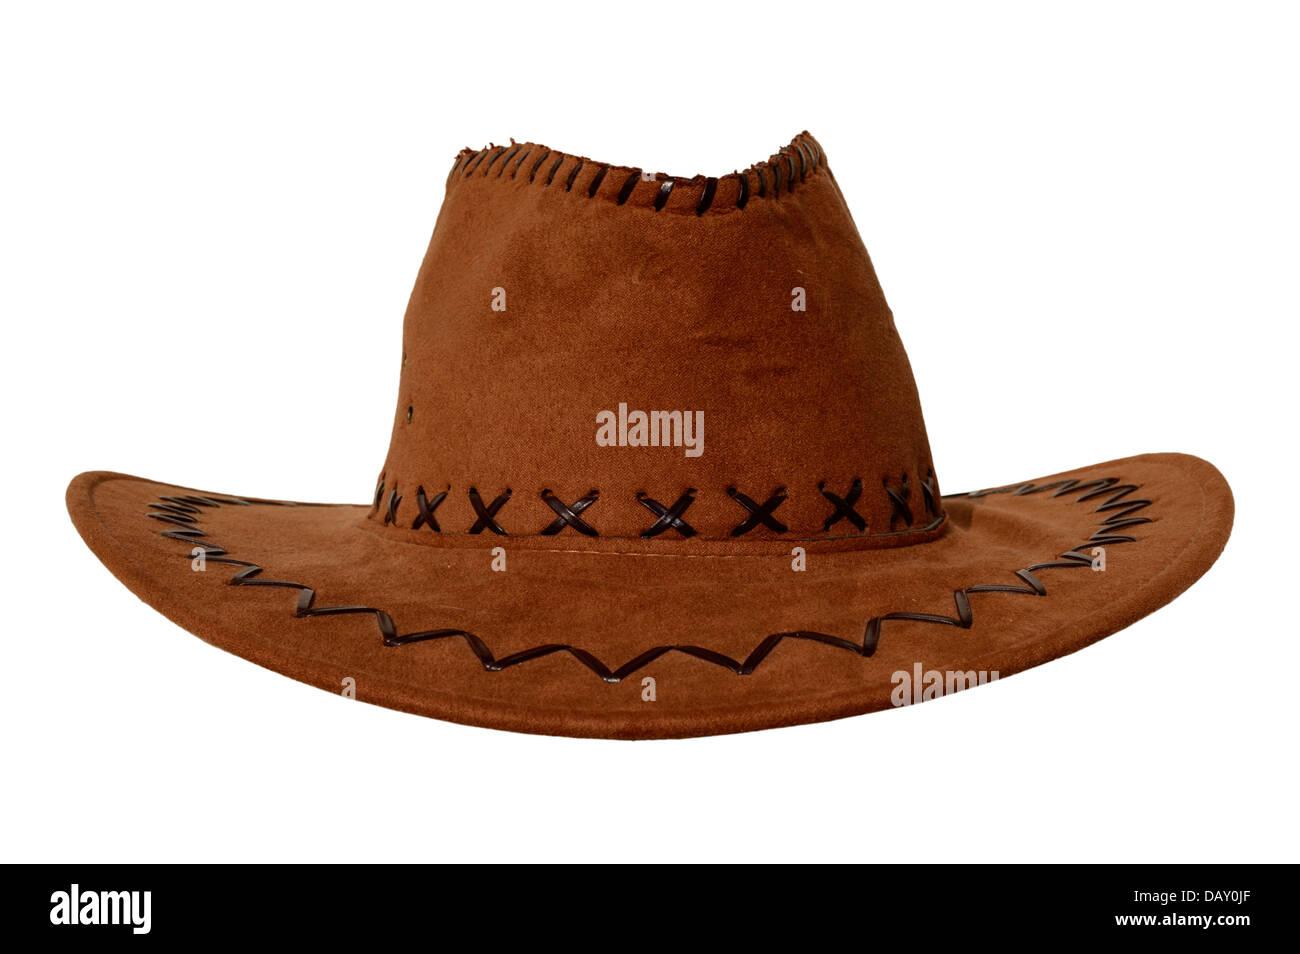 brown cowboy hat - Stock Image